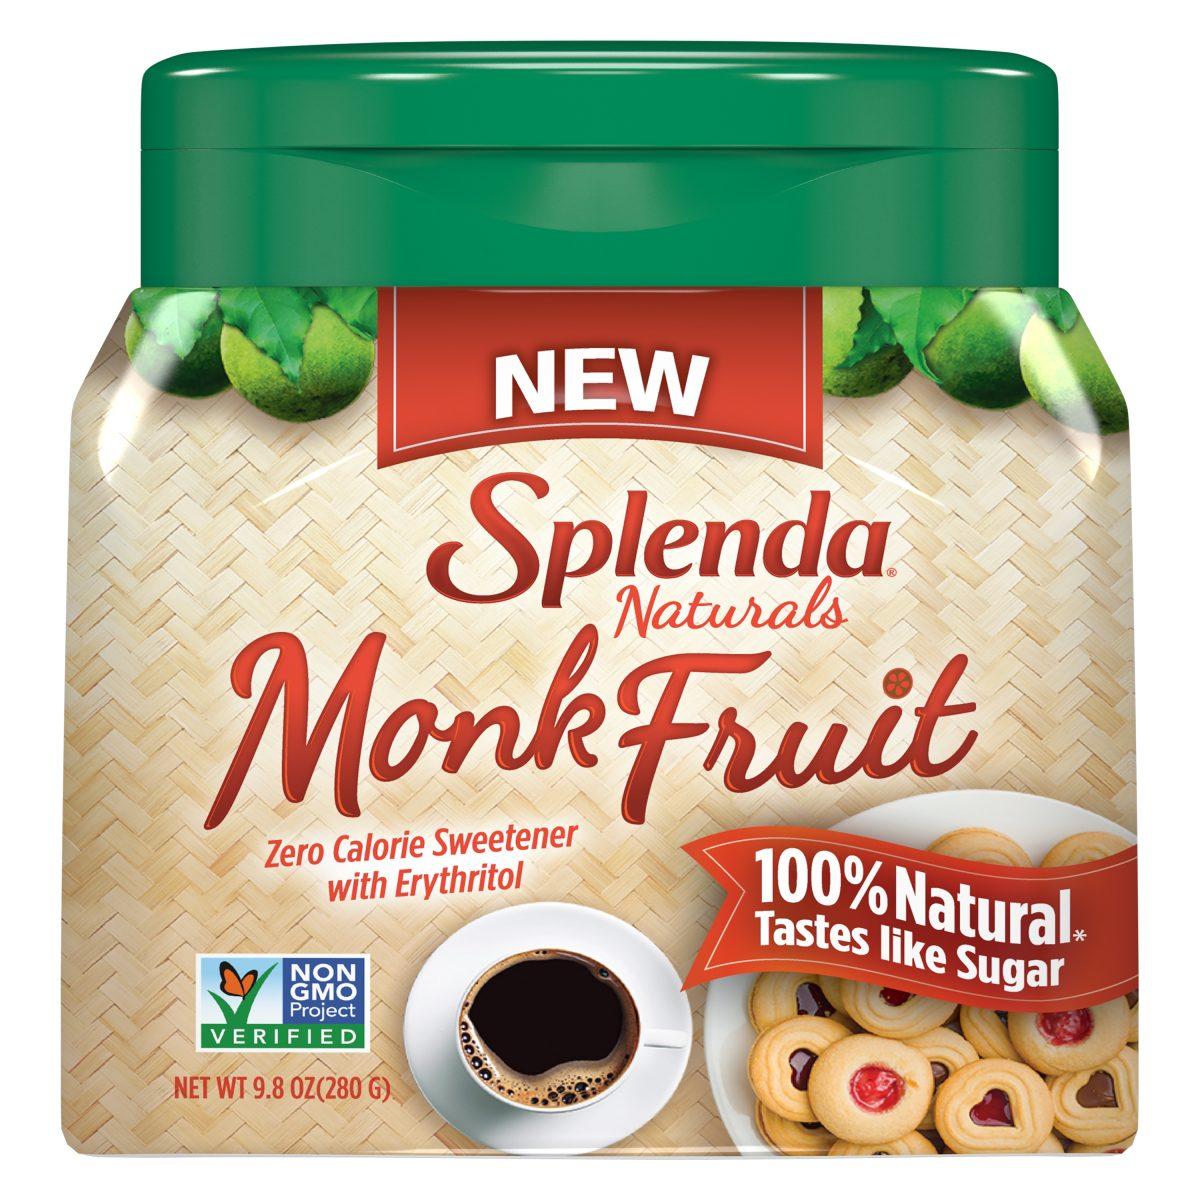 Splenda Monk Fruit Sweeteners